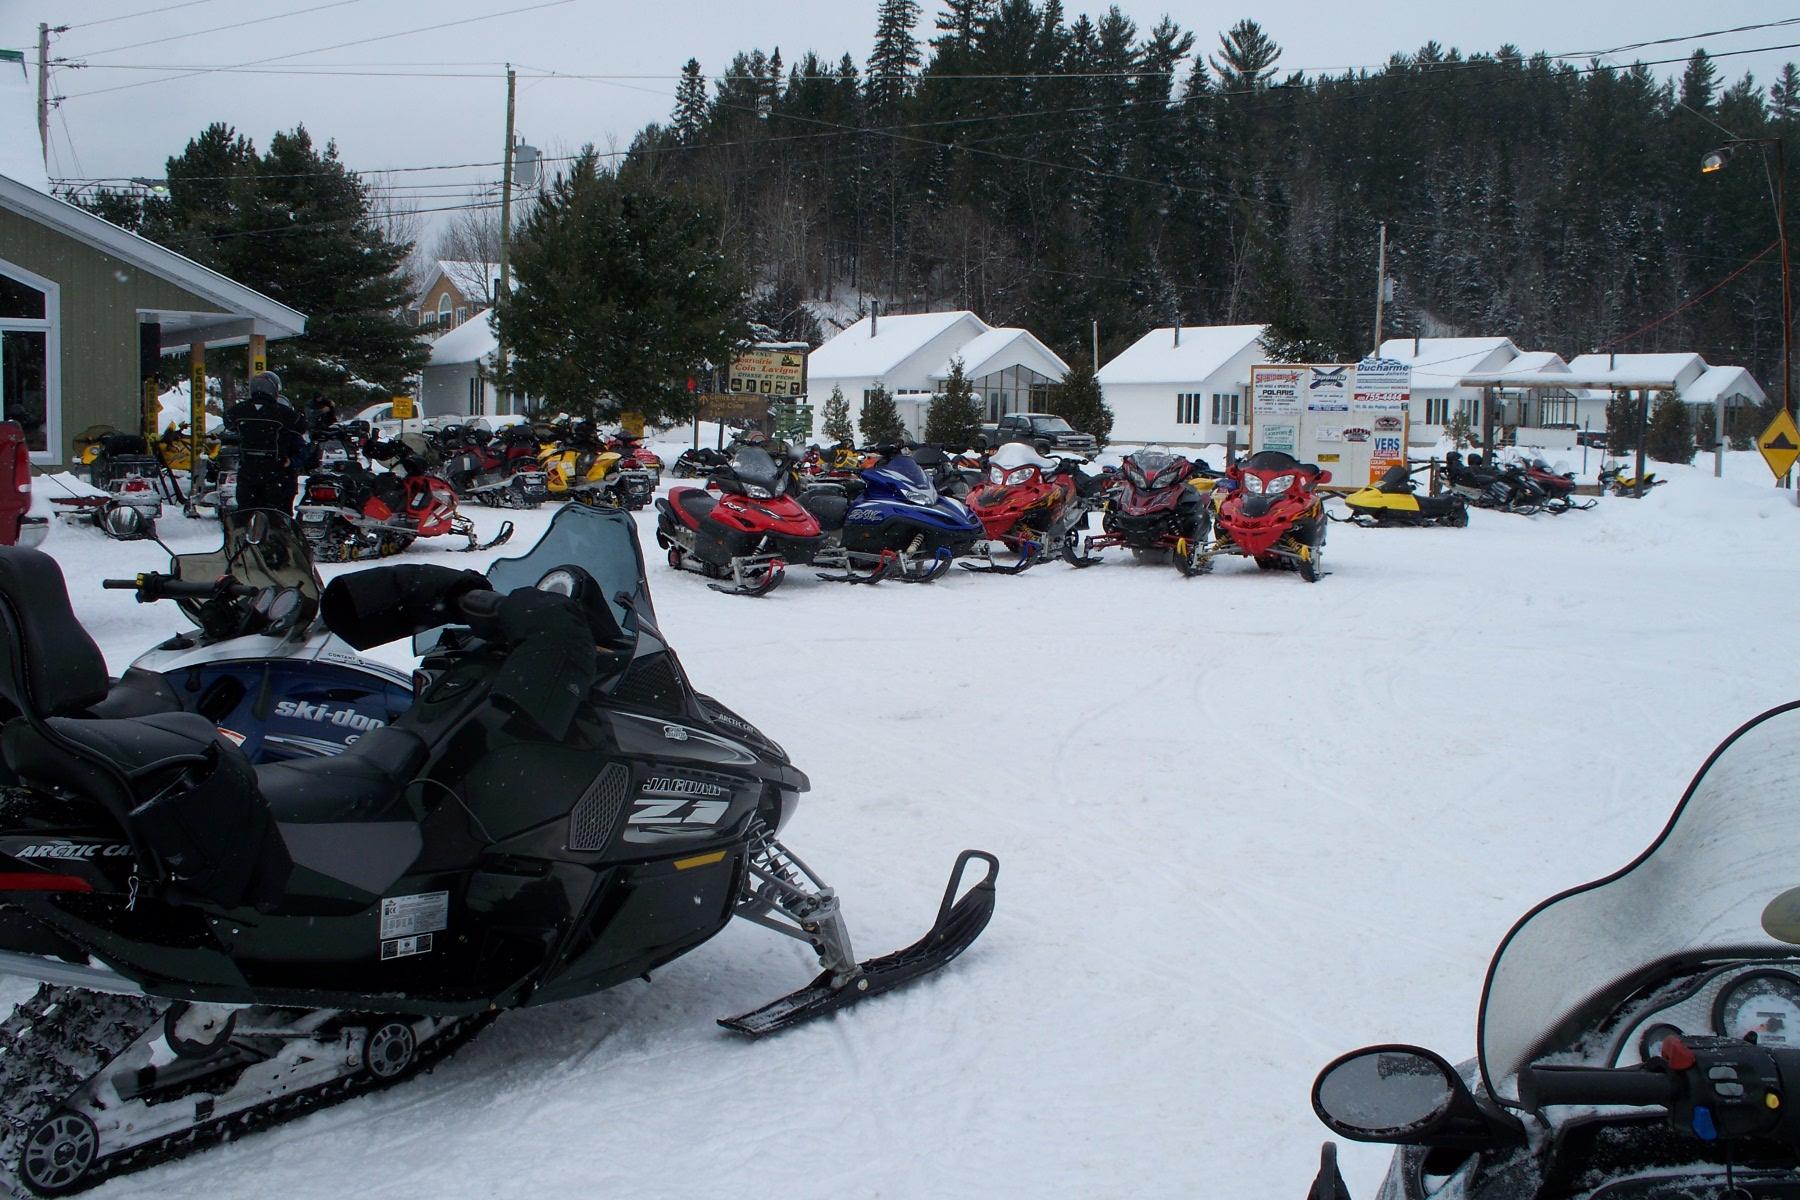 Location motoneige Quebec location motoneige a louer